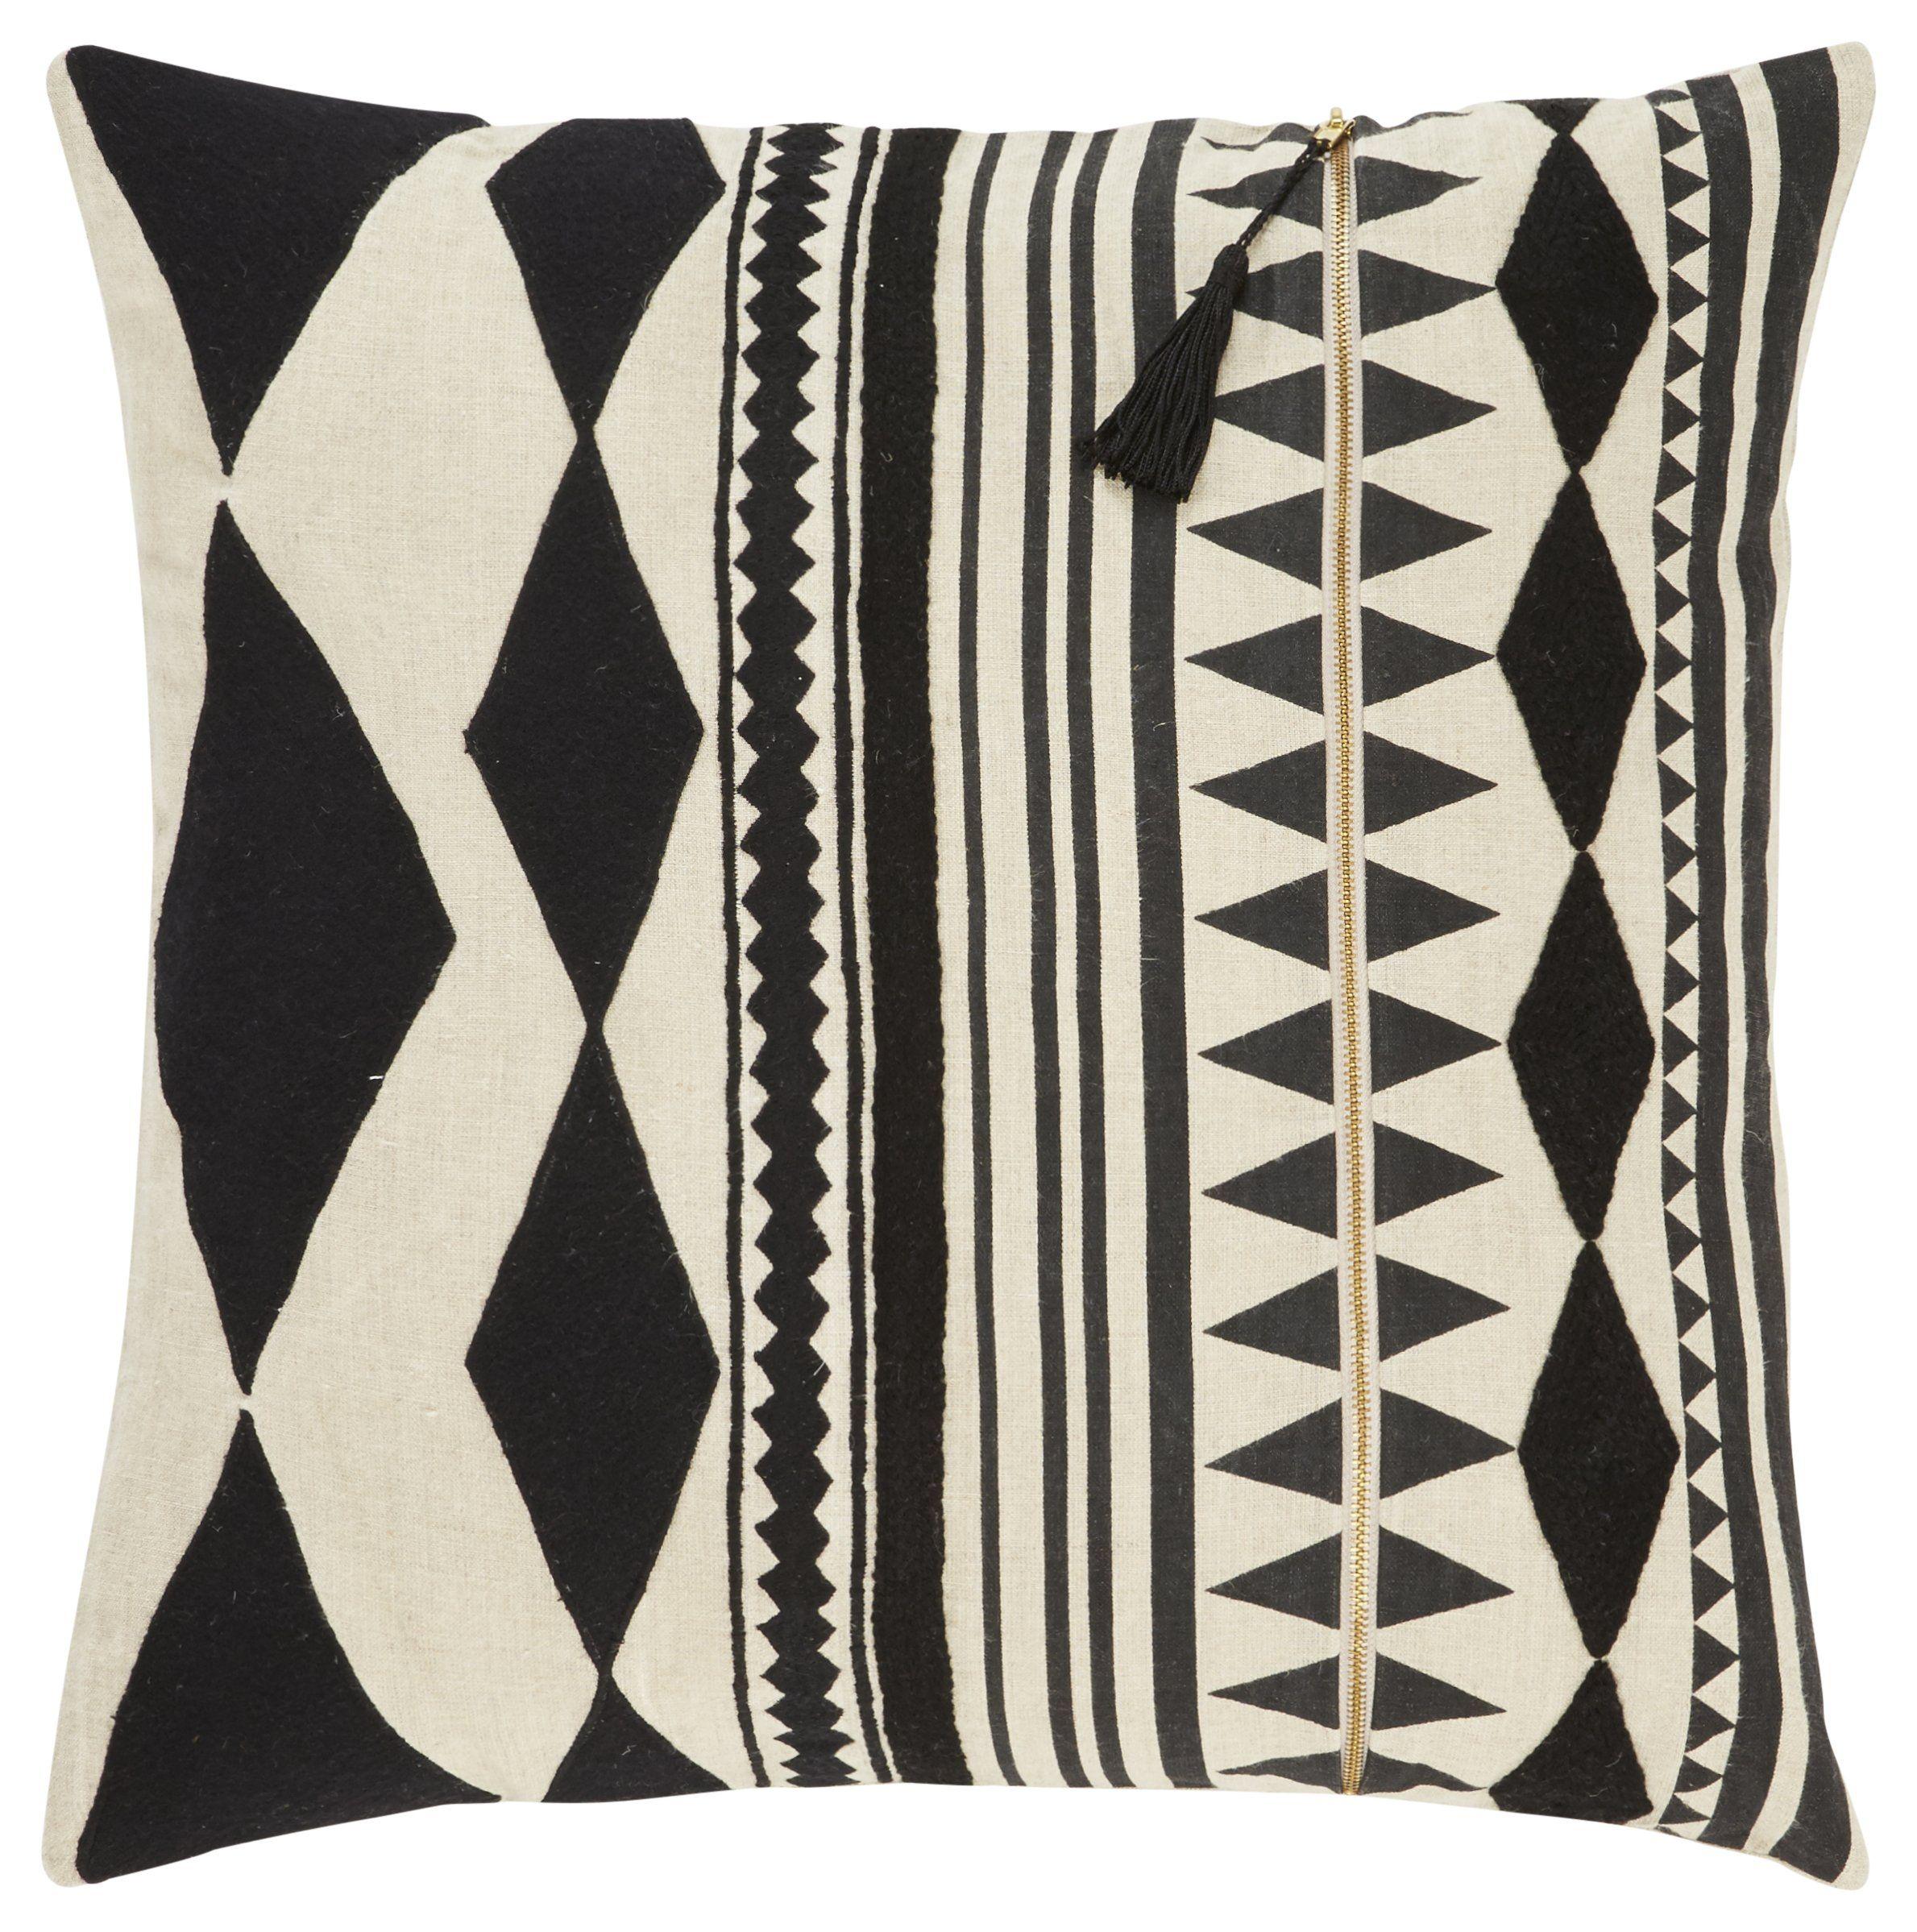 Jaipur living cosmic by nikki chu cnk18 black modern contemporary pillow